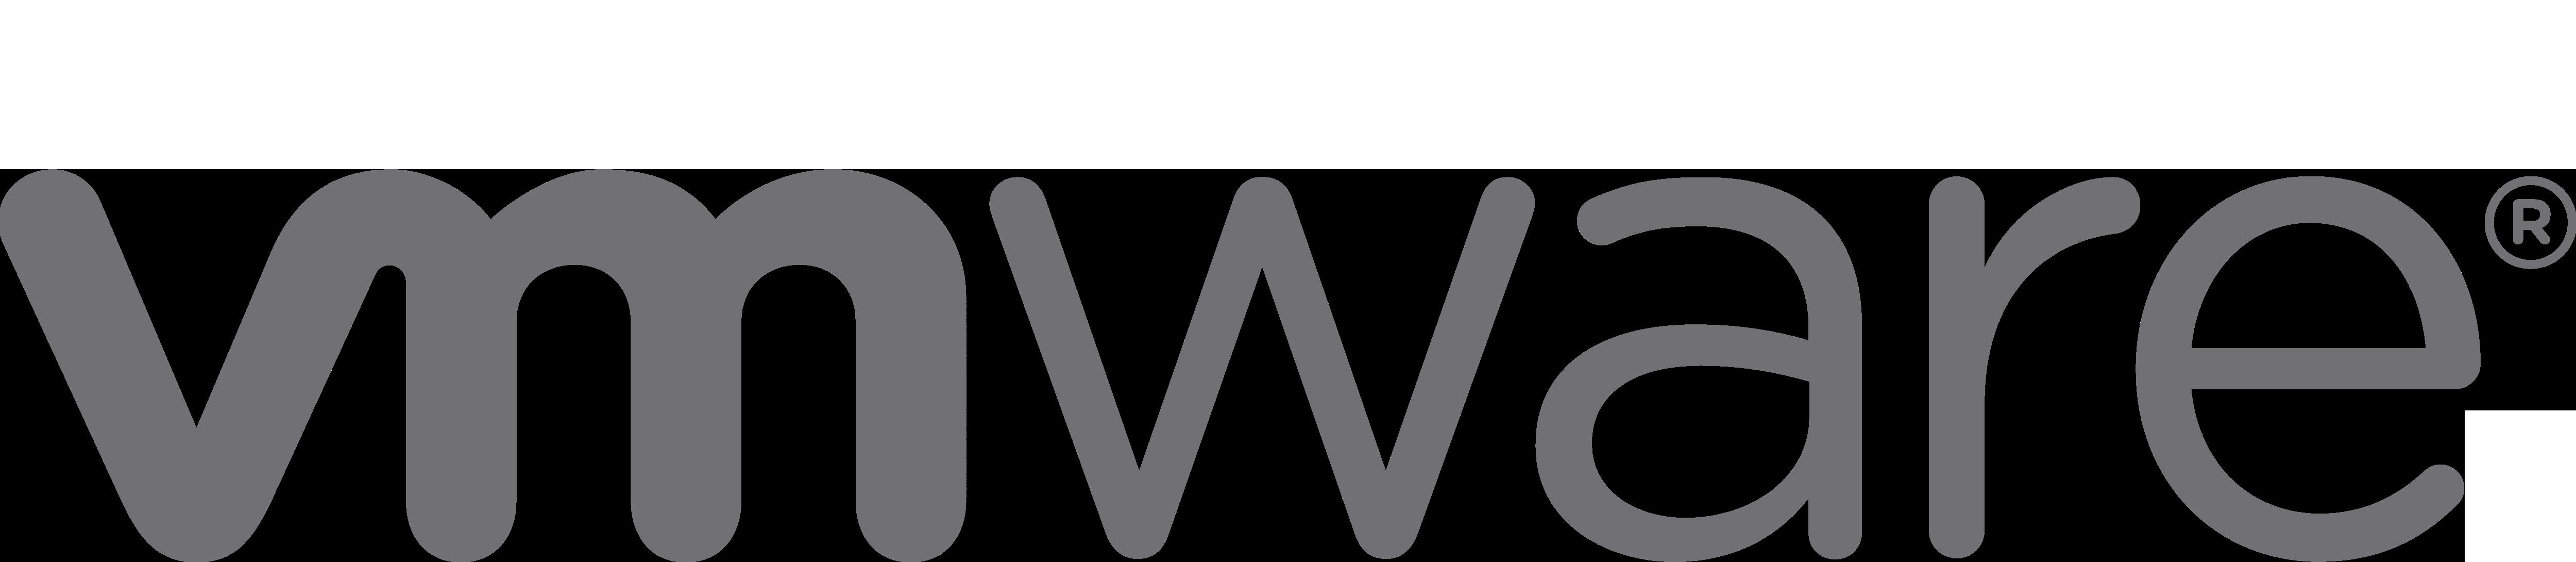 vmware-virtualization-software-optio-data-10999